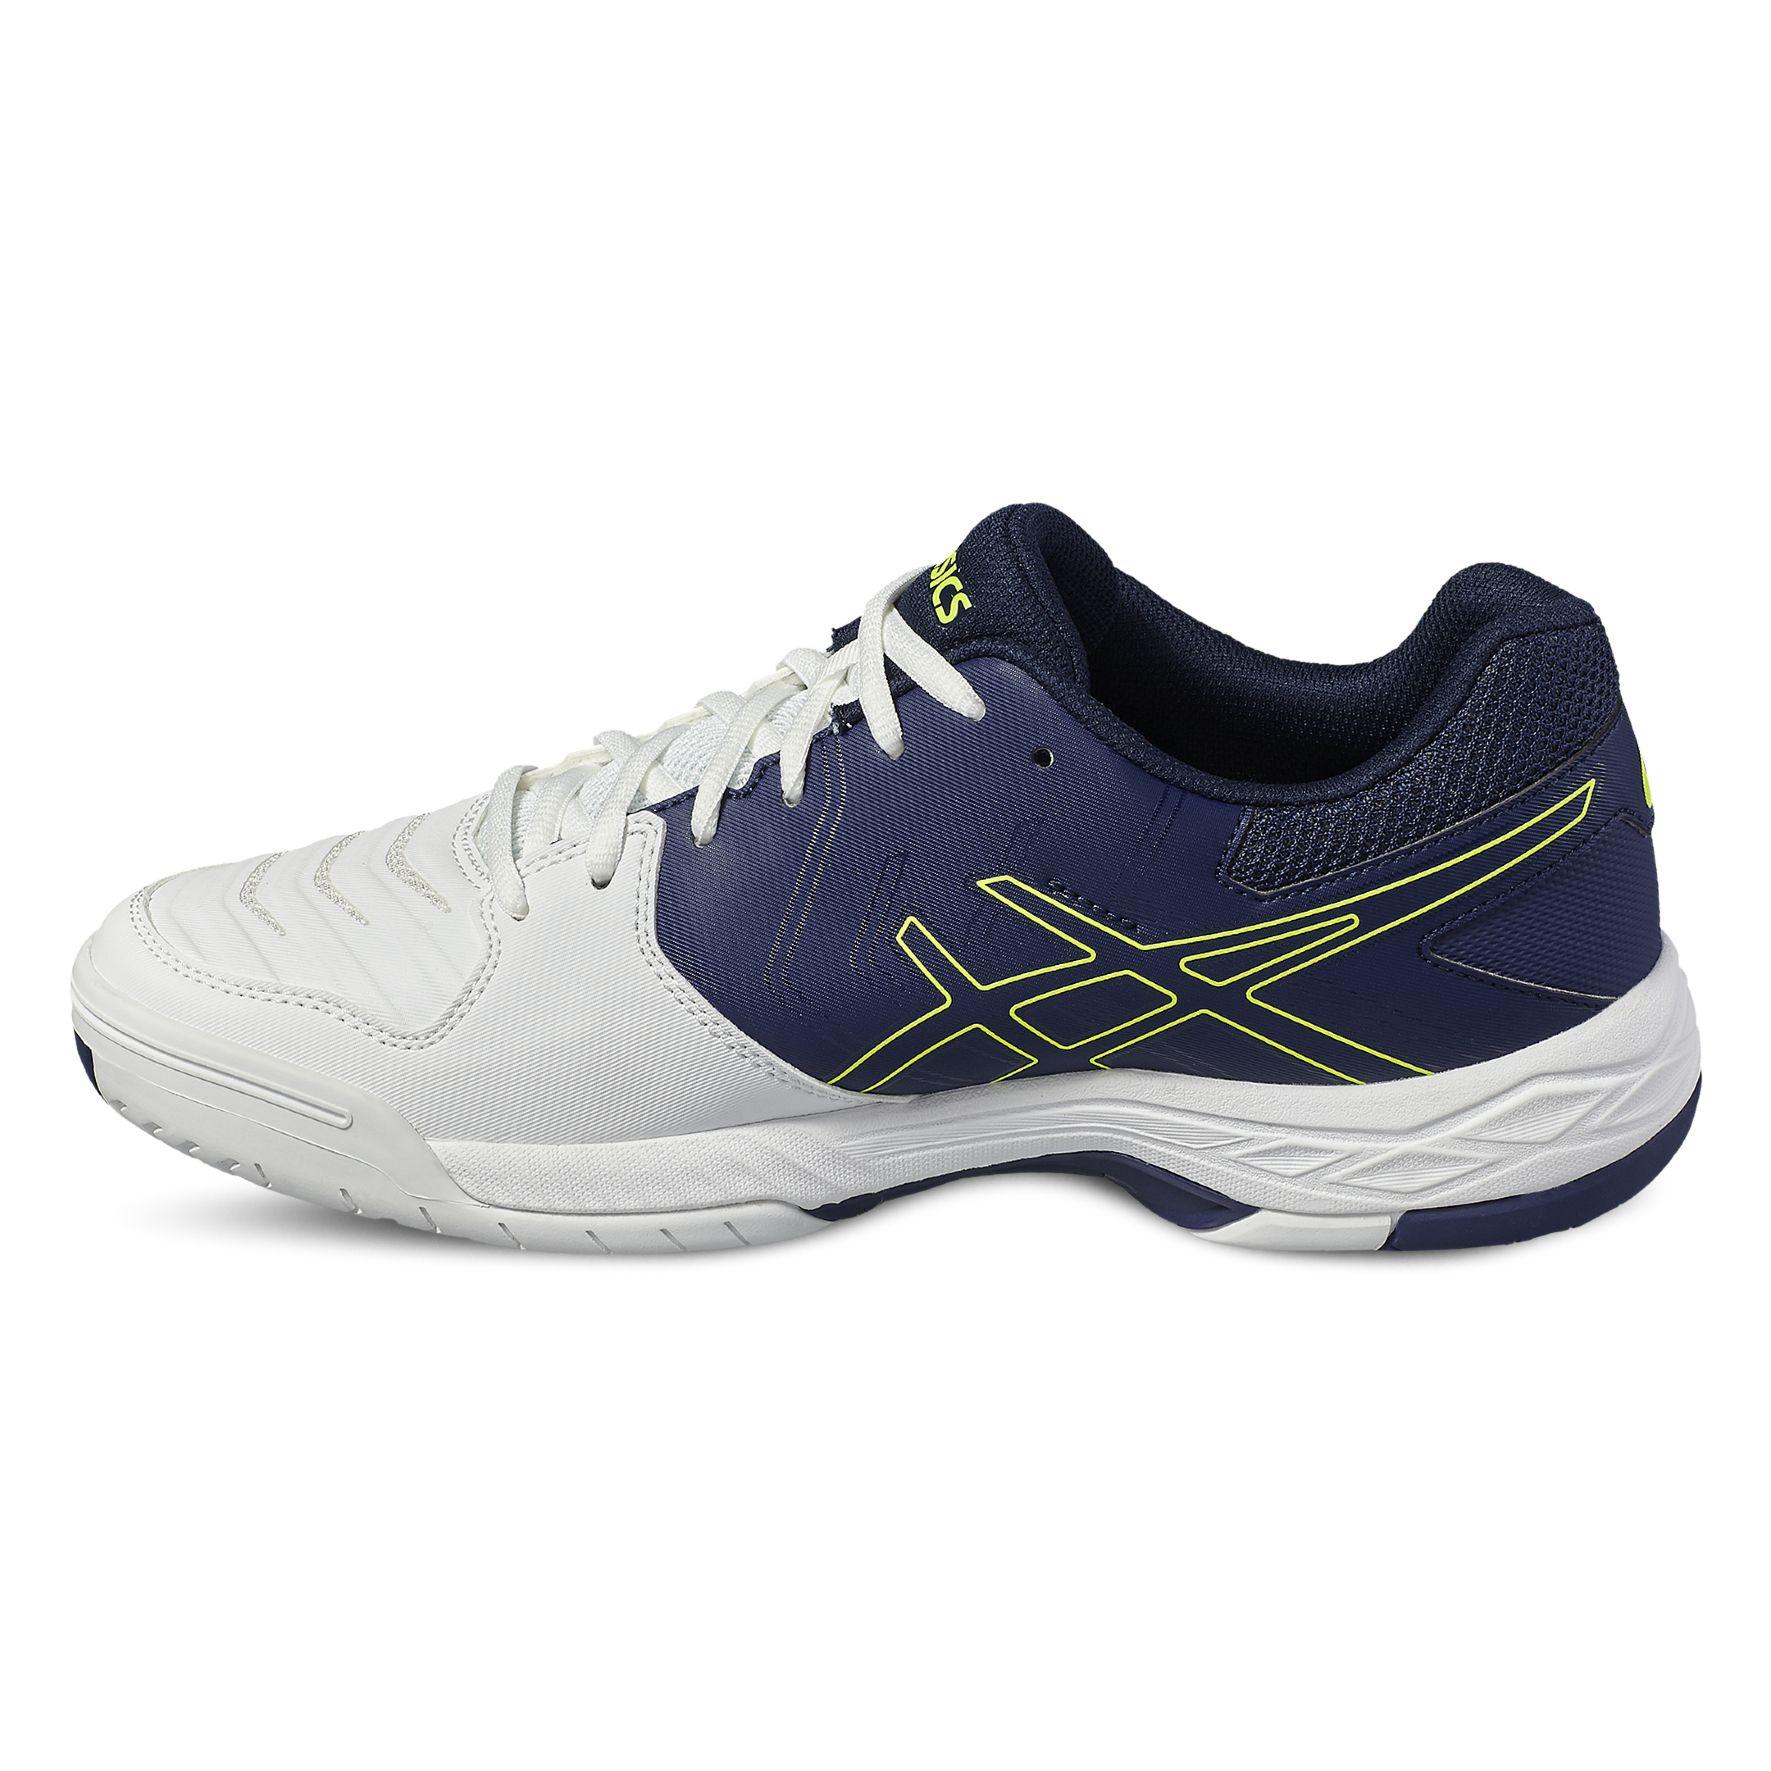 asics gel 6 mens tennis shoes